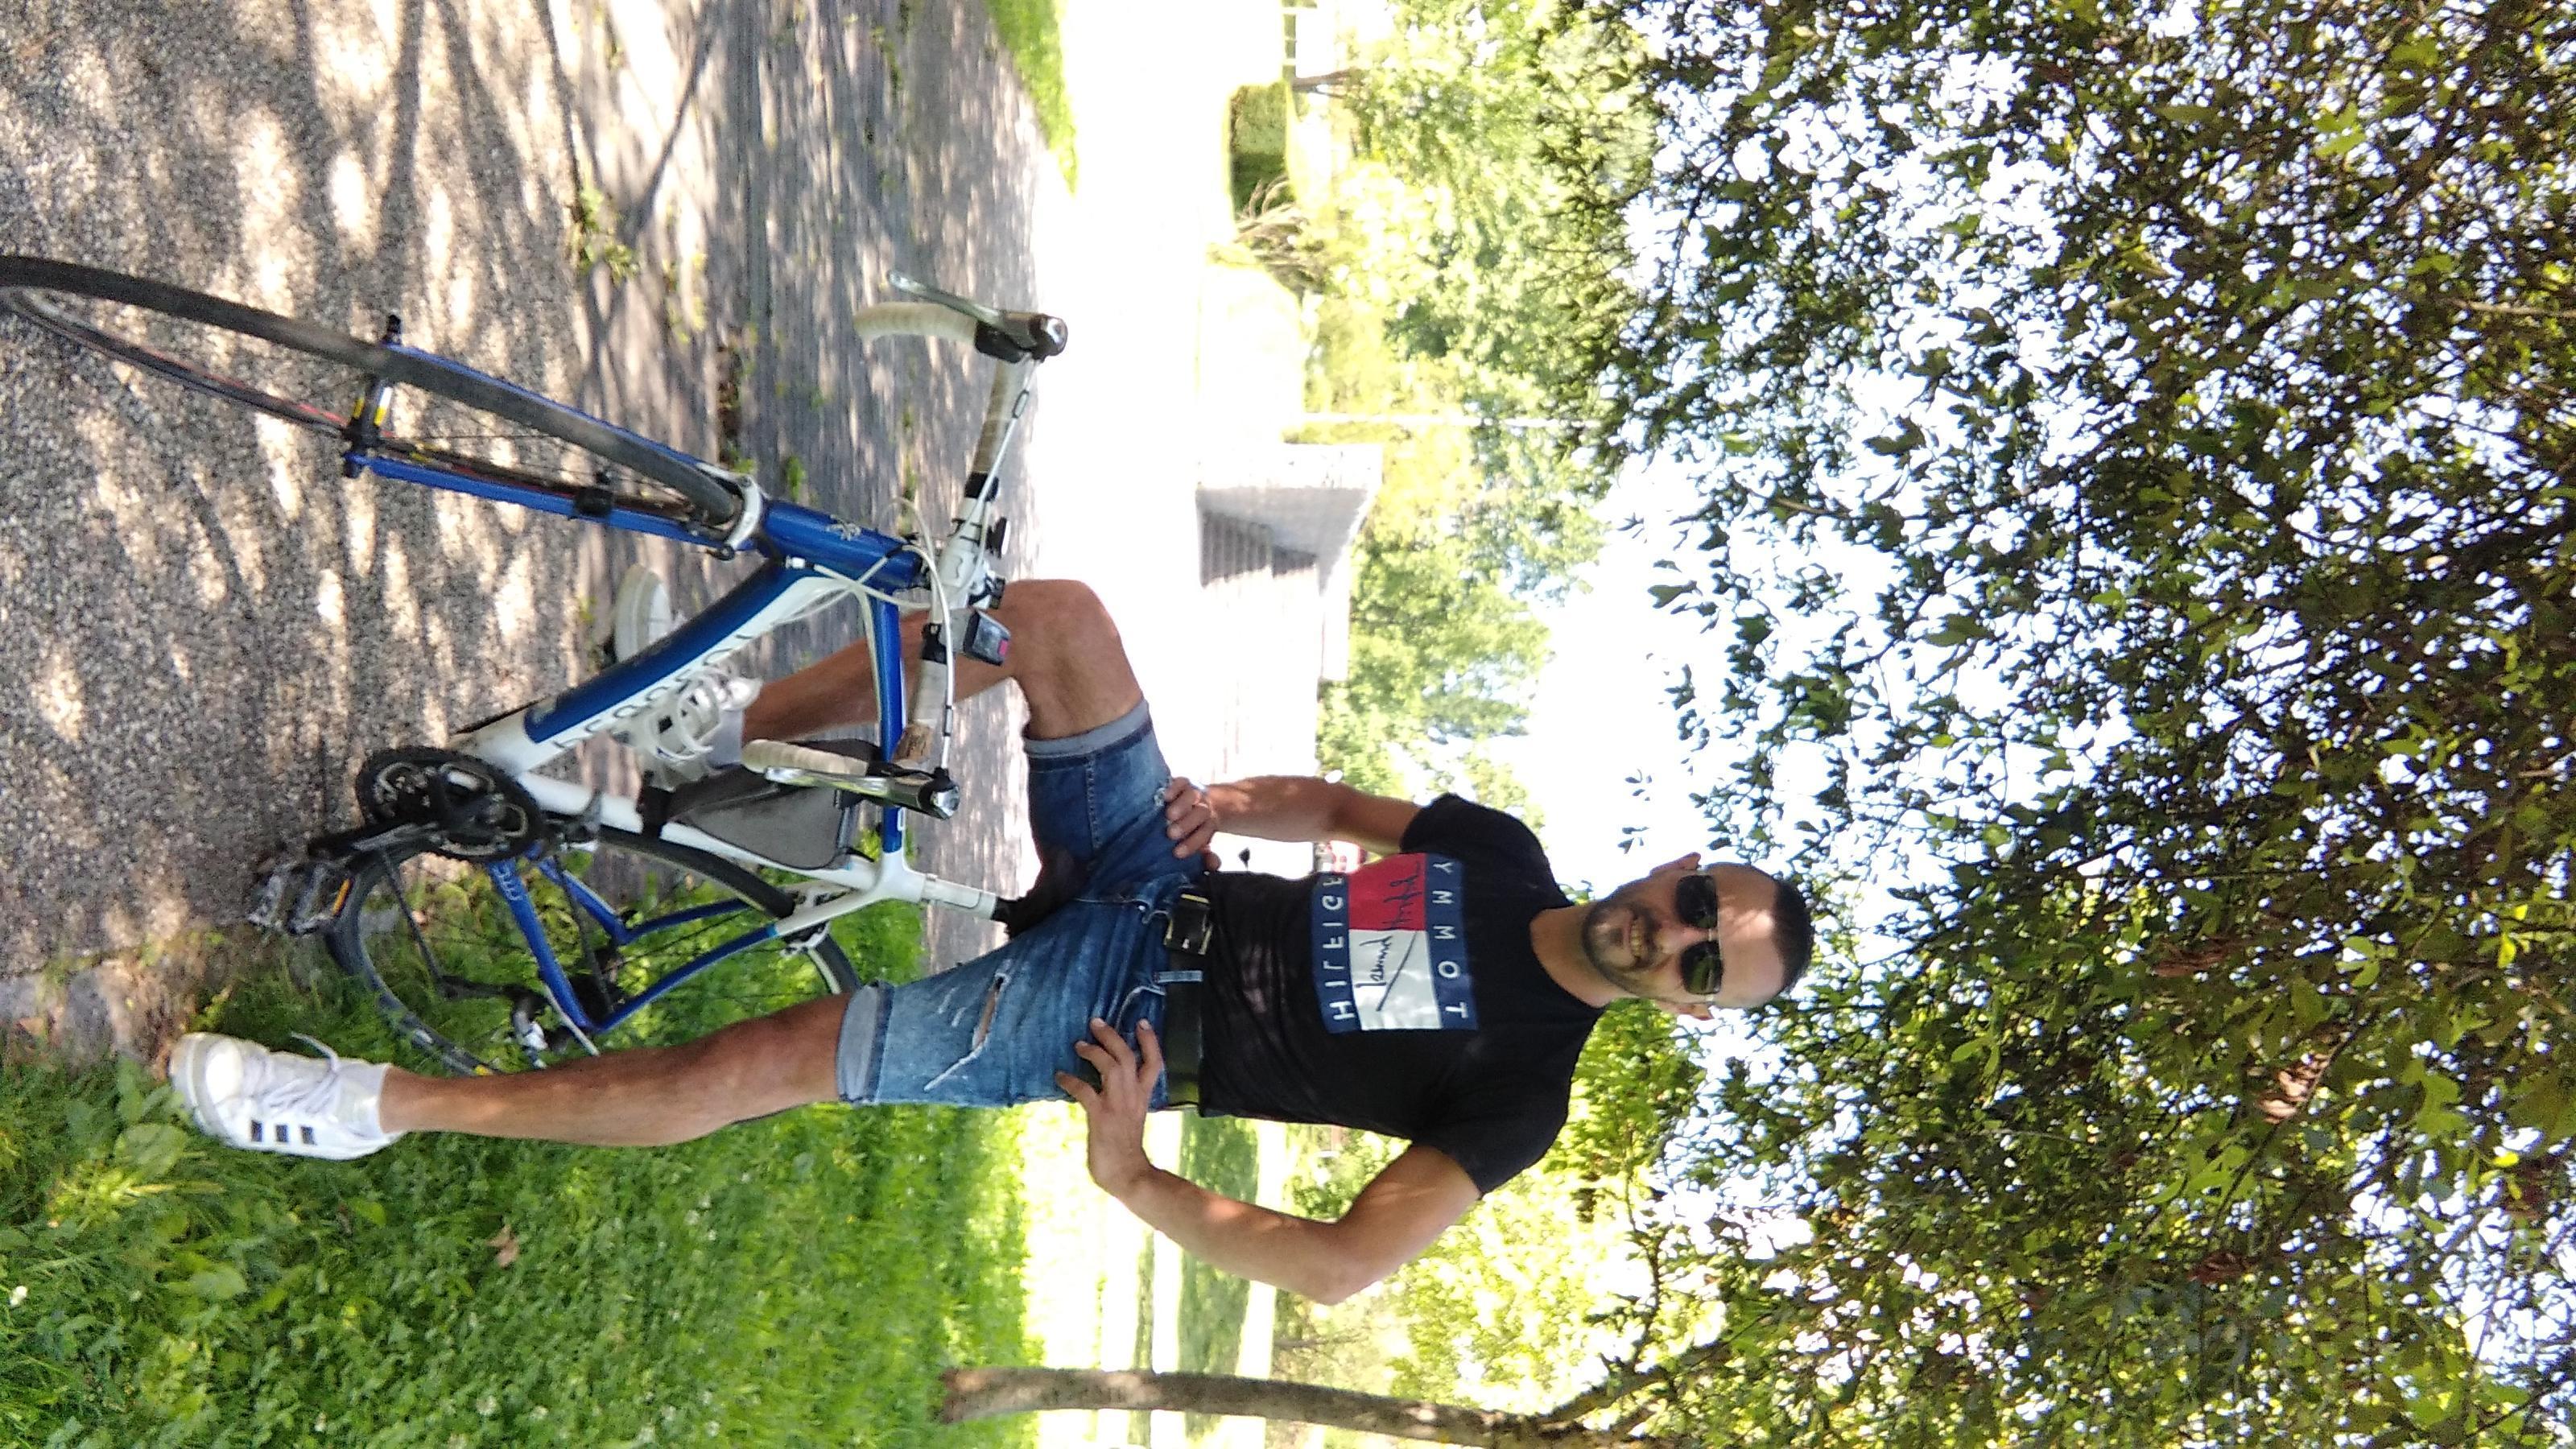 Cyclistex?s=cjrludeou8odgrntcmy6fmmsvgkntn+xdf8o2koqfn4=